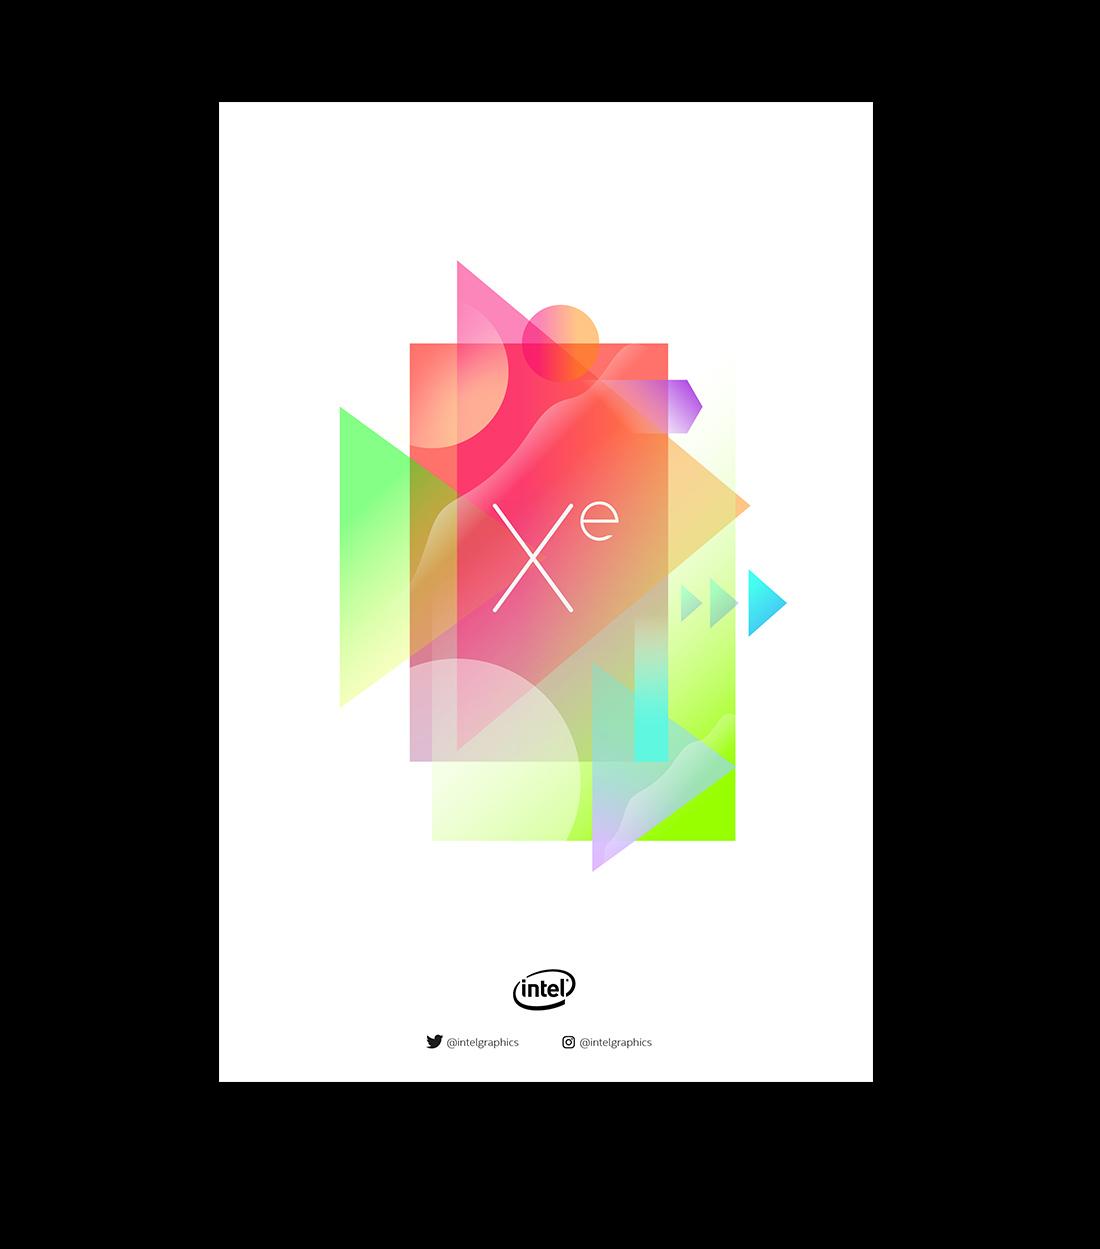 Intel_Art